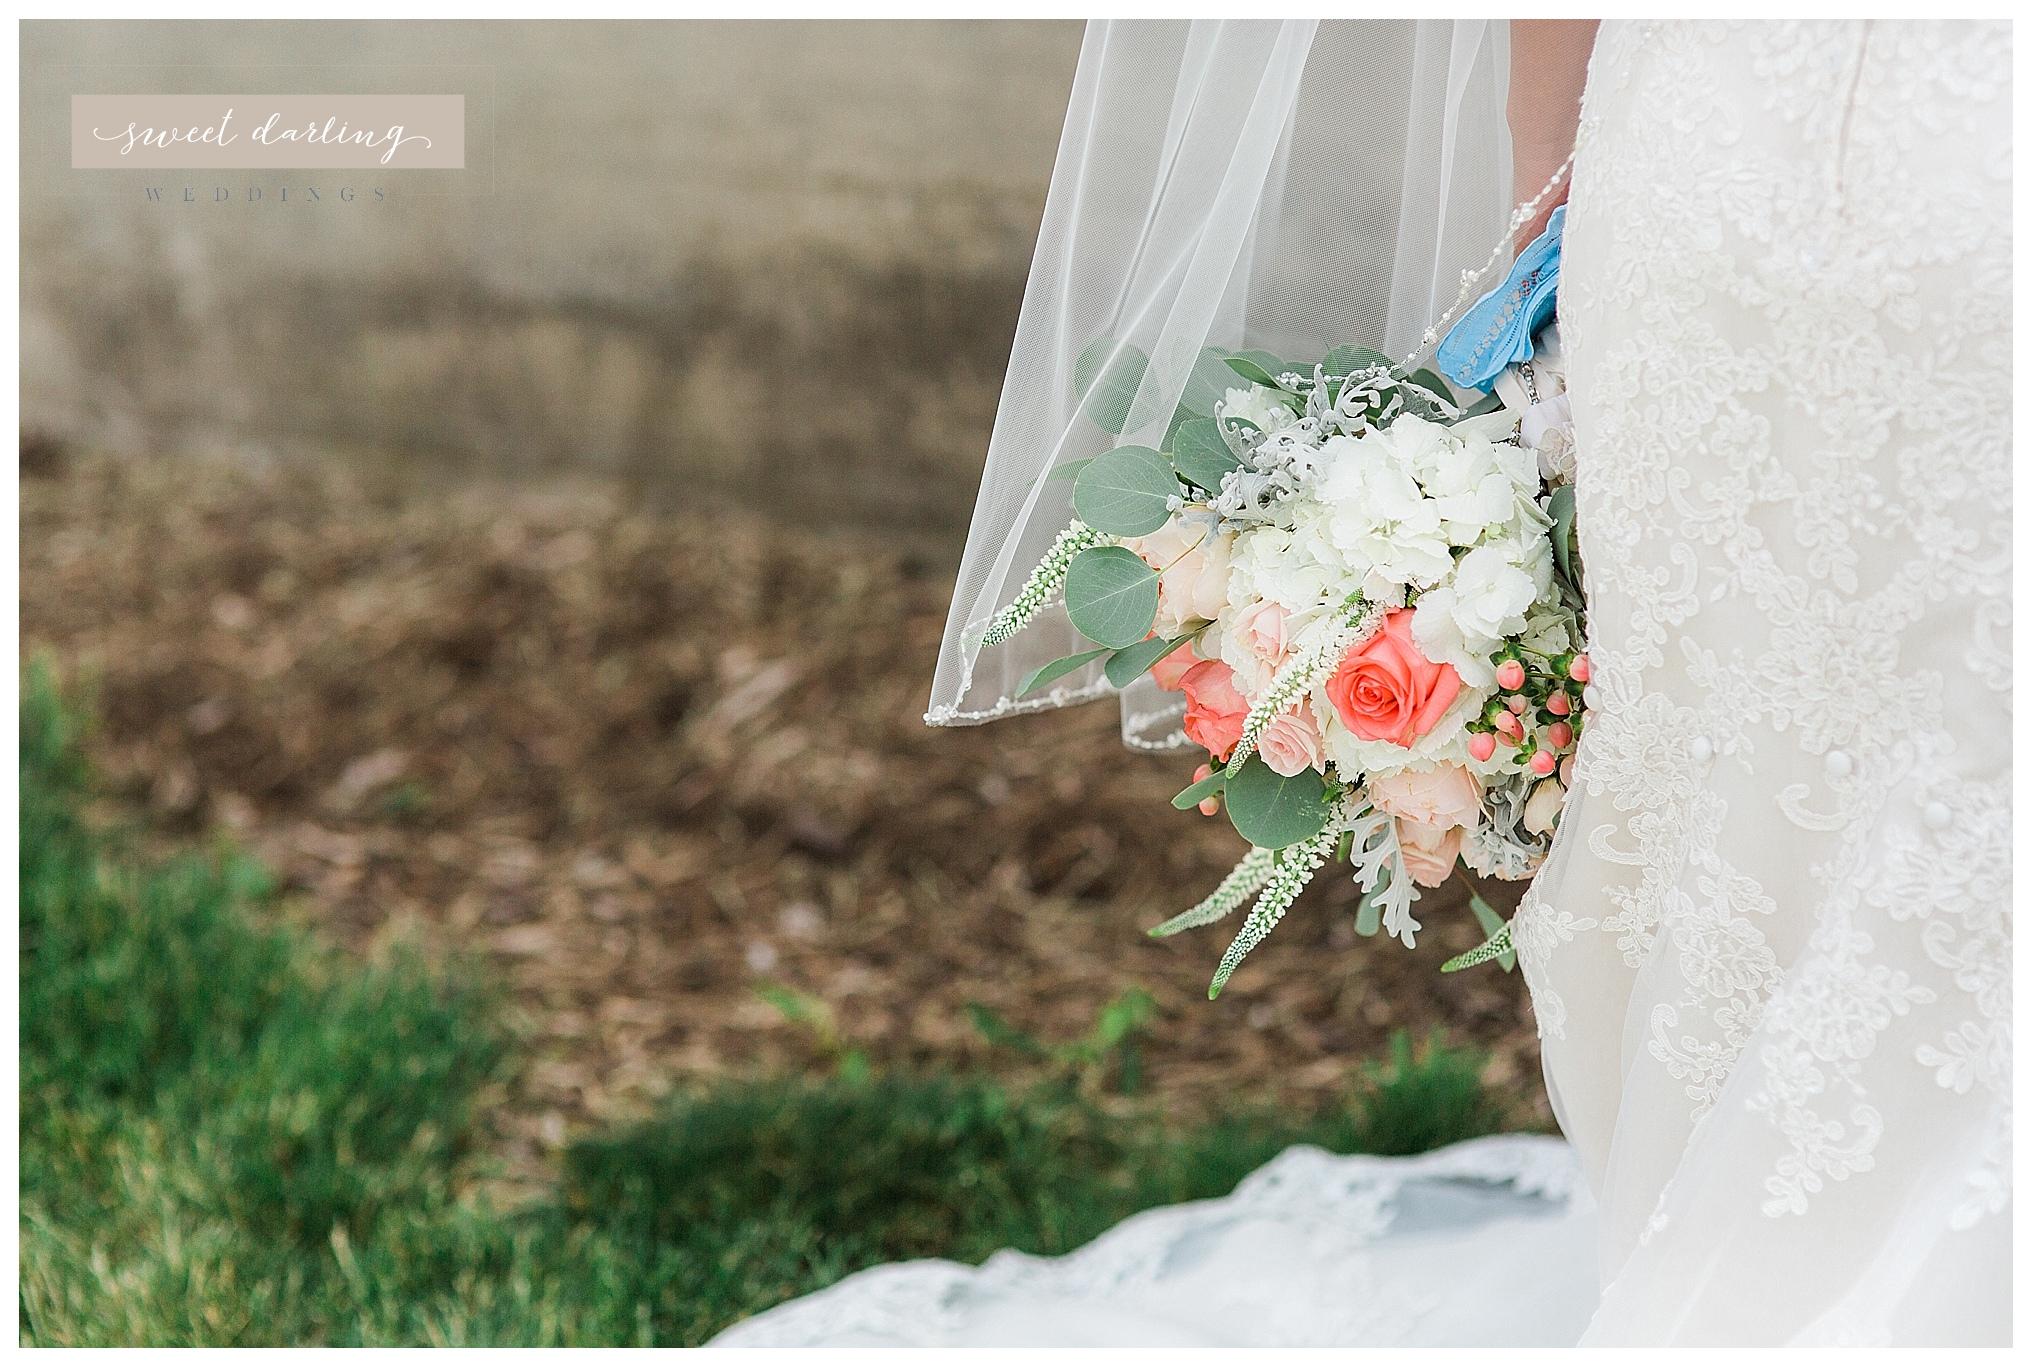 Rpaxton-illinois-engelbrecht-farm-country-wedding-photographer-sweet-darling-weddings_1273.jpg